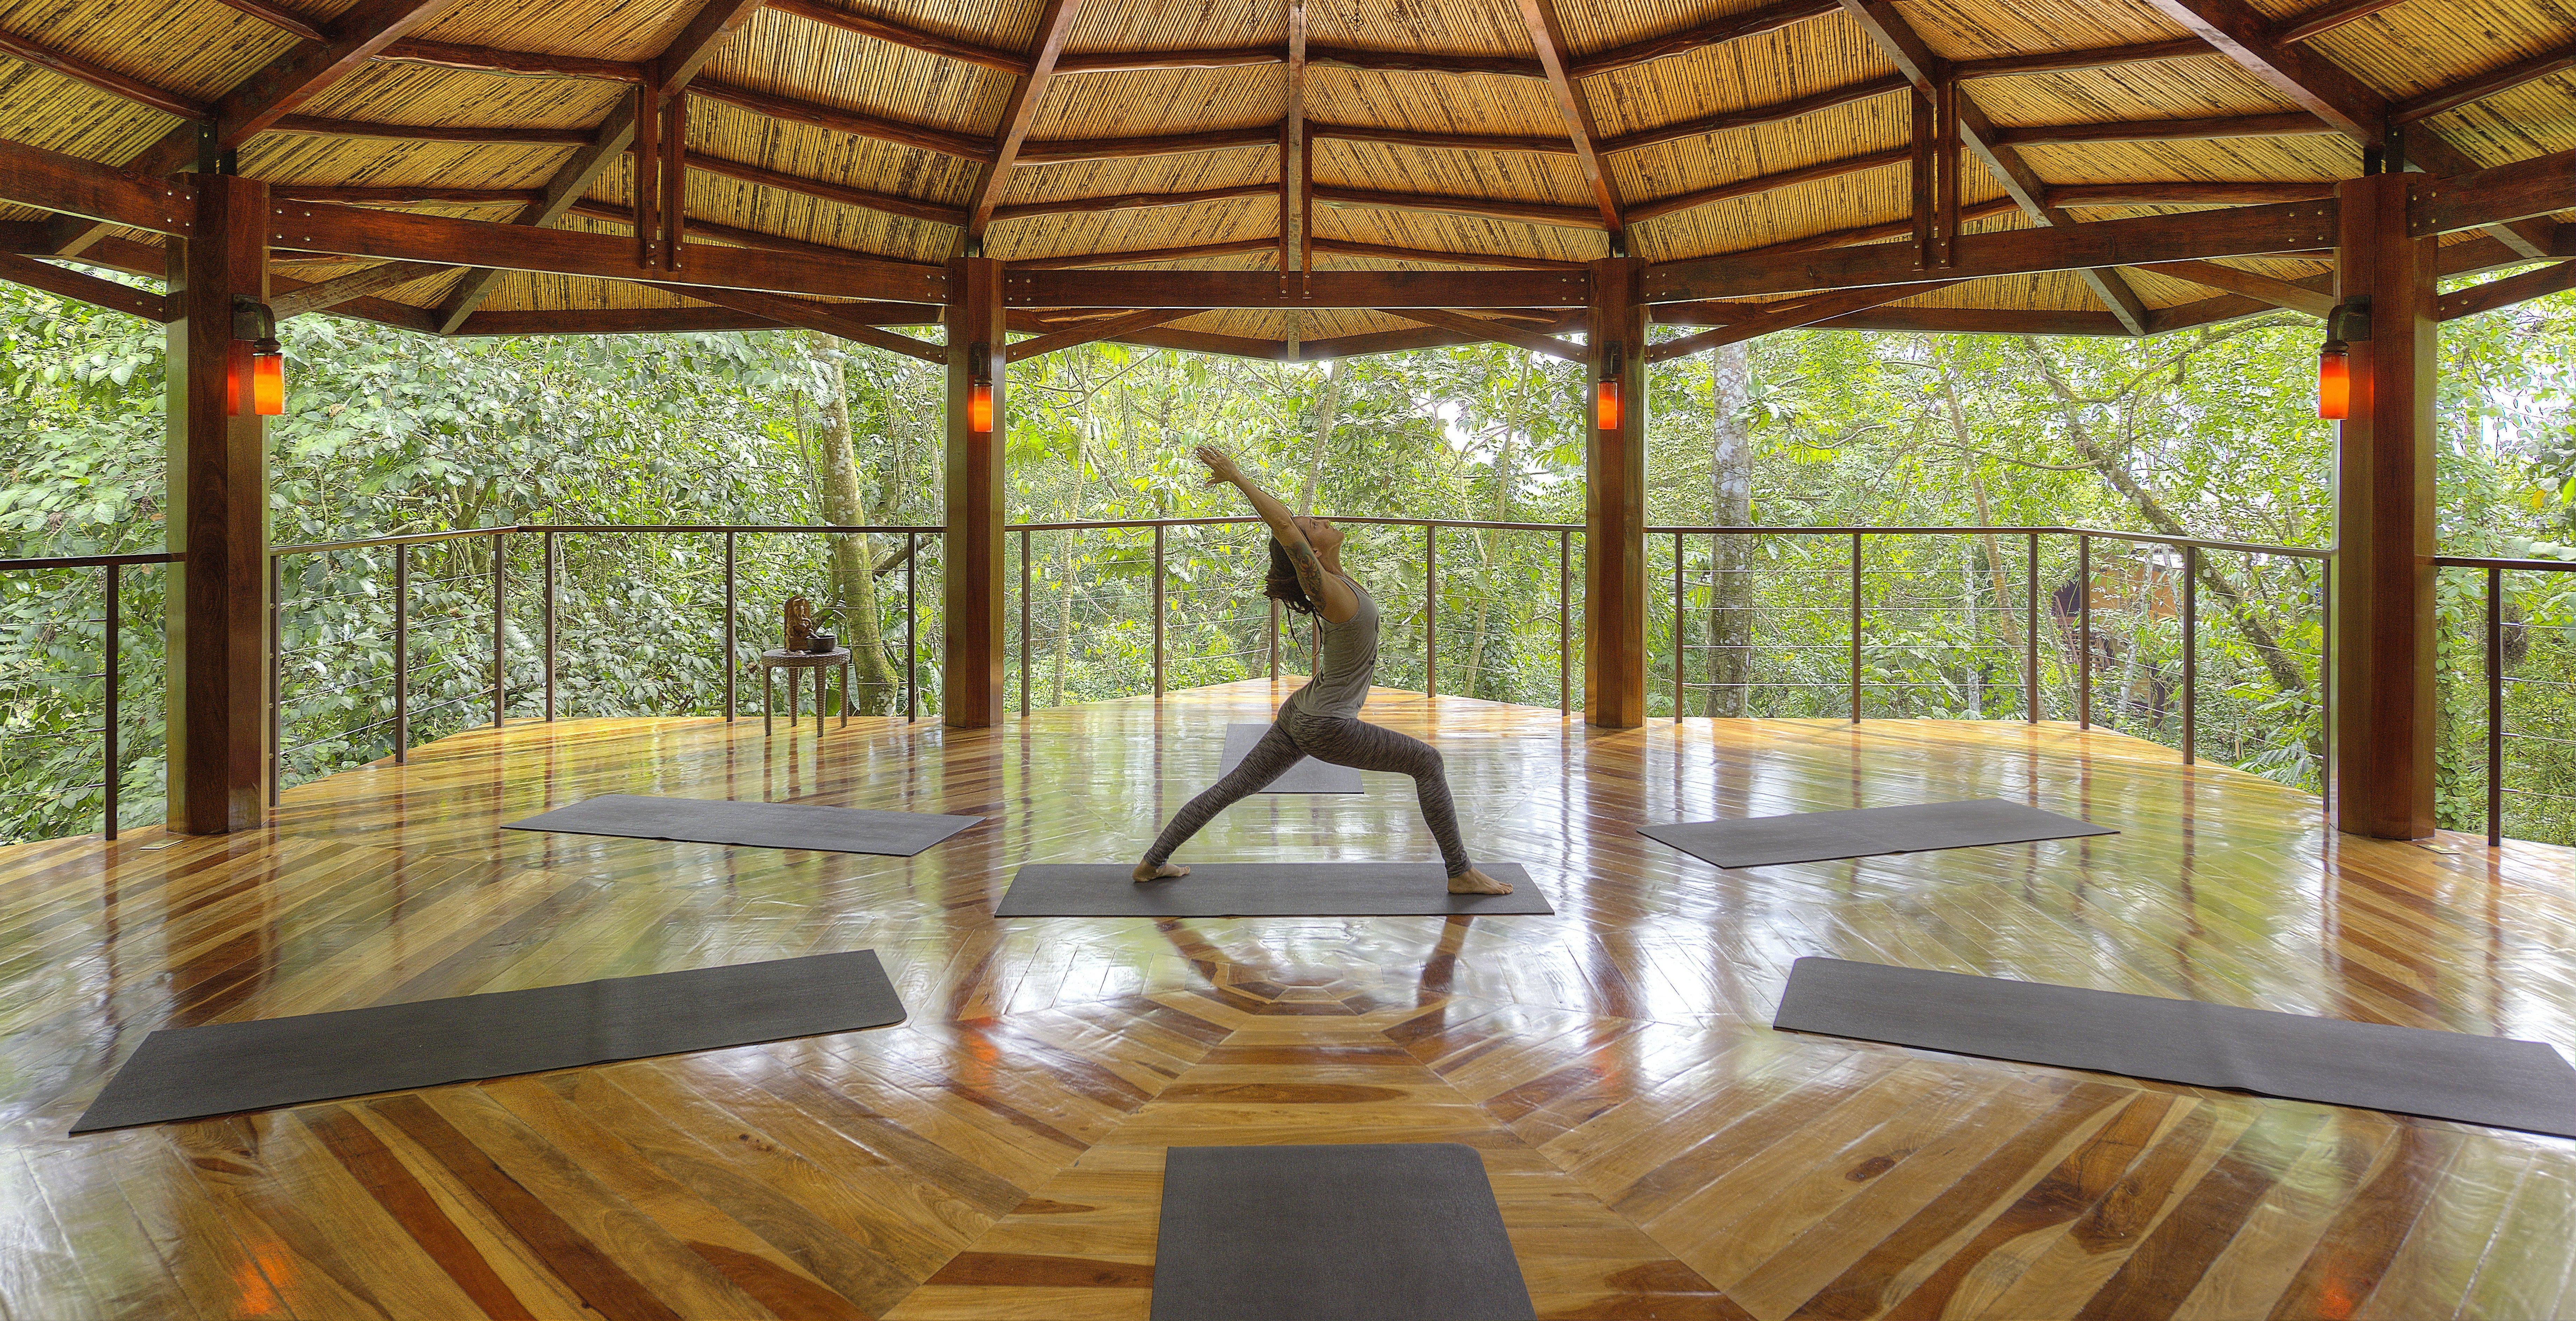 nayara-springs-arenal-yoga-class